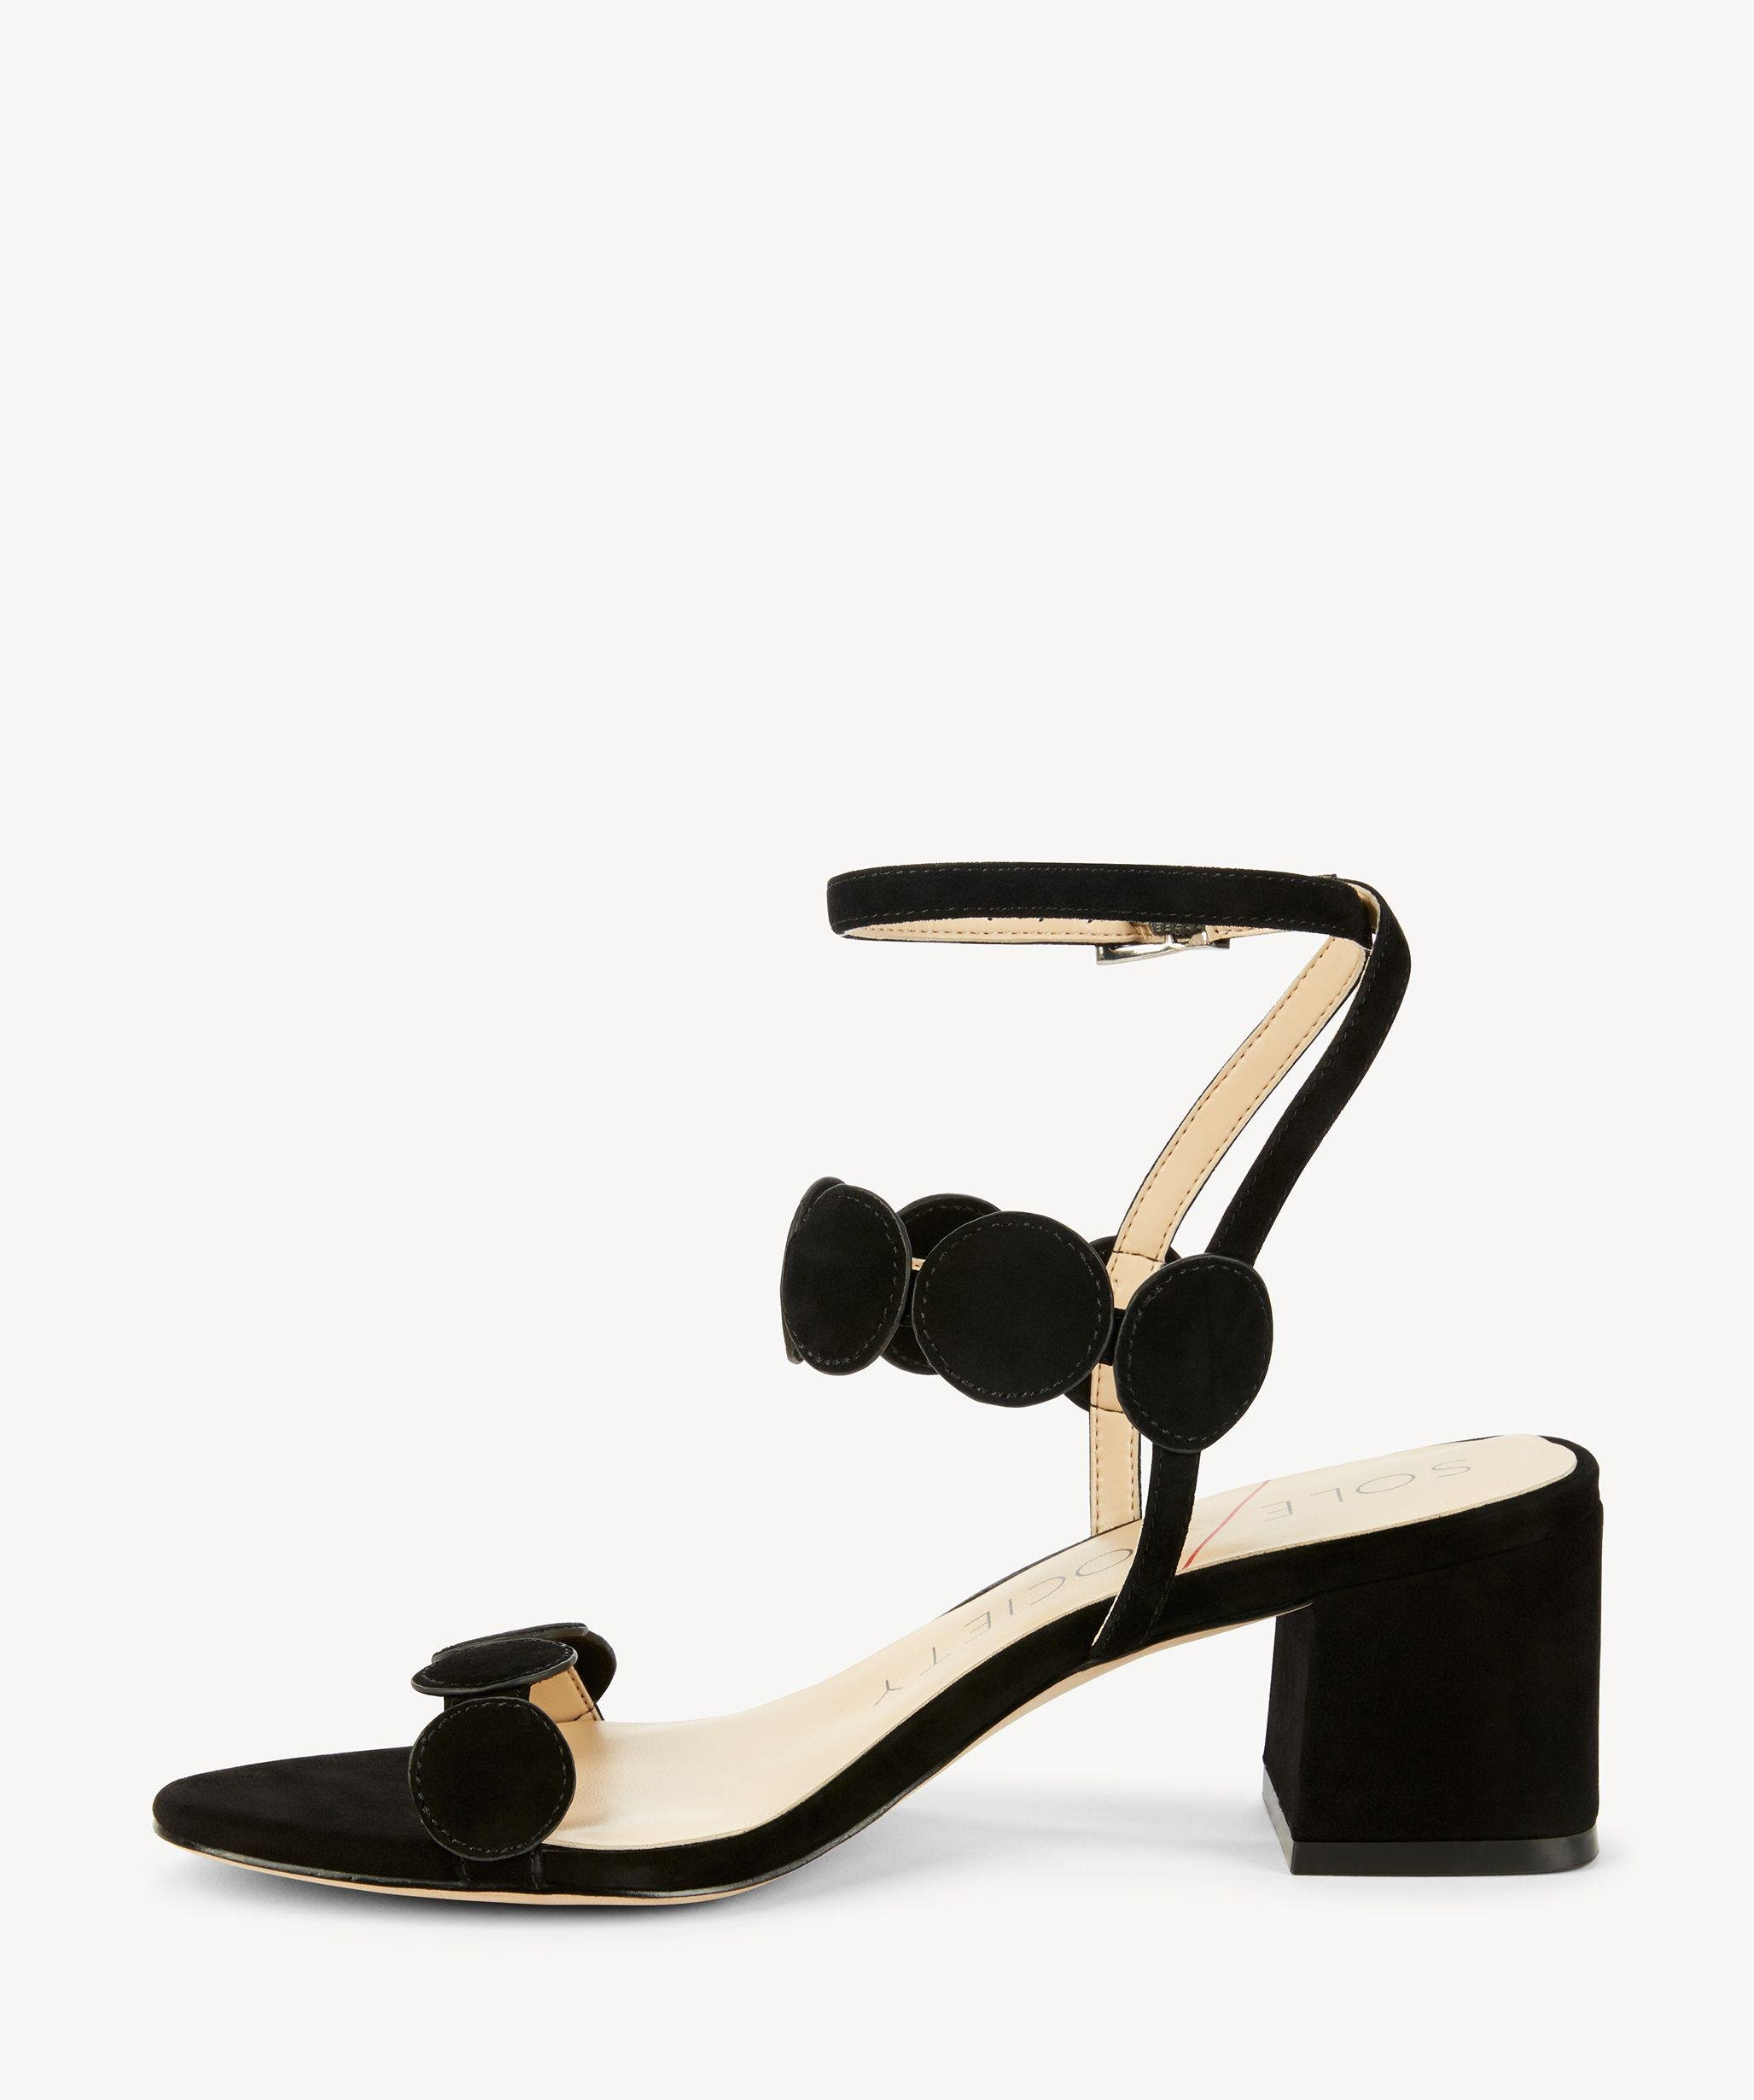 94b55144f6a1 Lyst - Sole Society Shea Strappy Heeled Sandal in Black